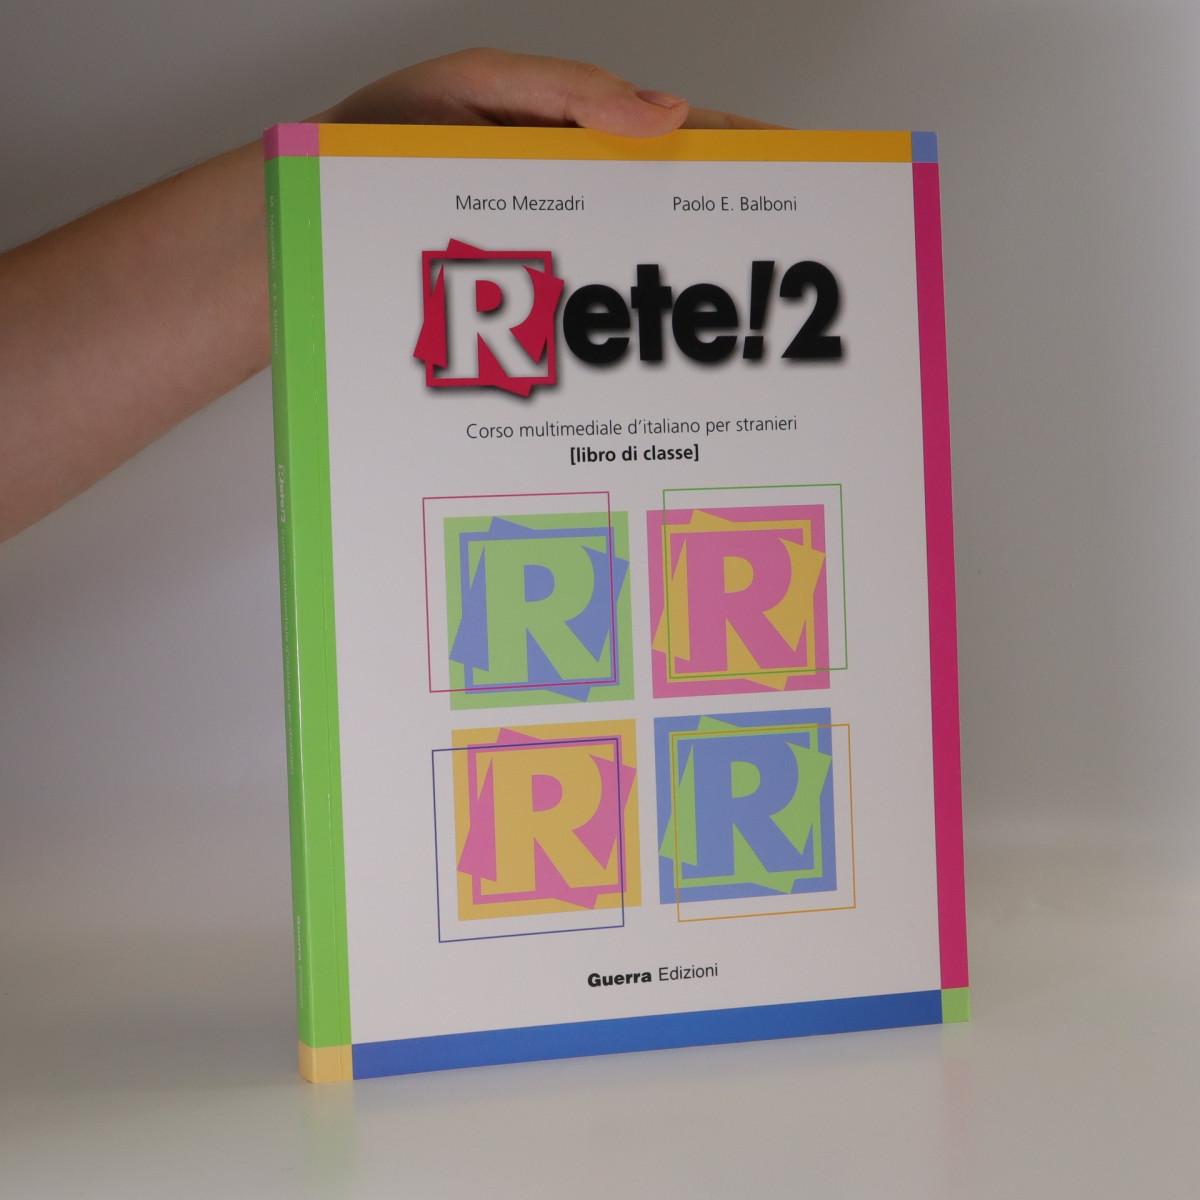 antikvární kniha Rete! 2. Corso multimediale d'italiano per stranieri, neuveden